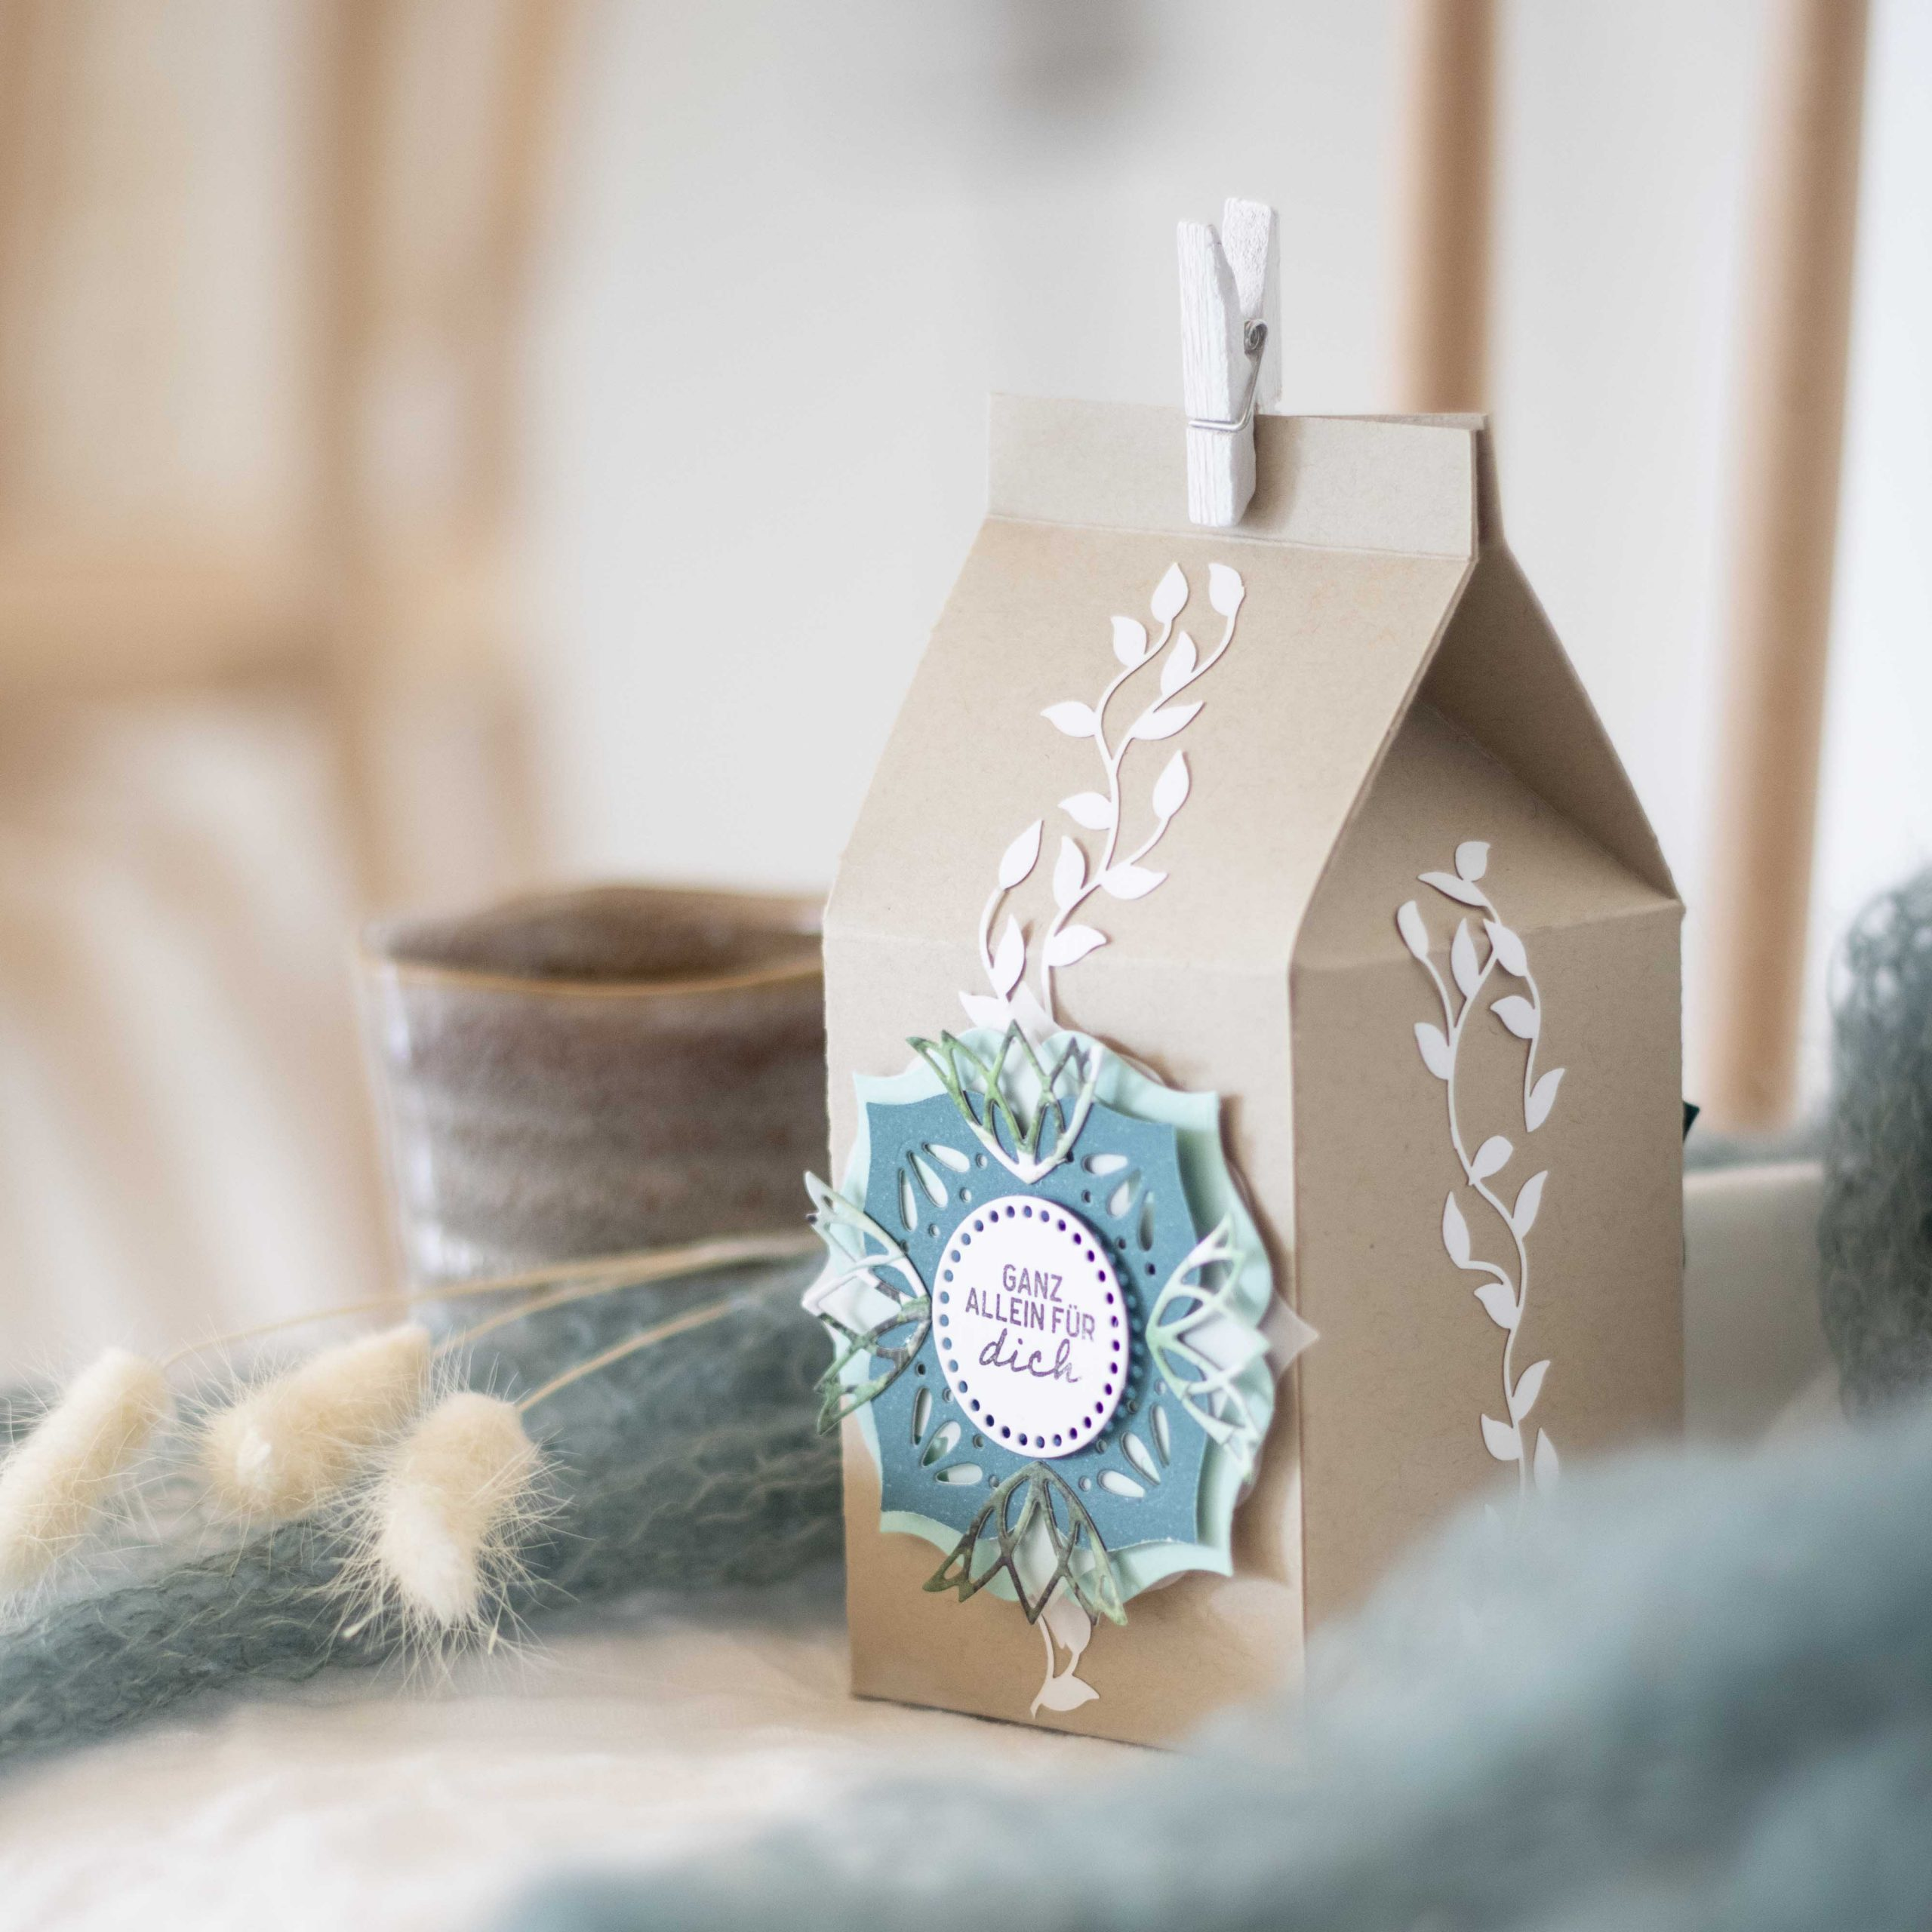 Kleinke Milchkarton Verpackung